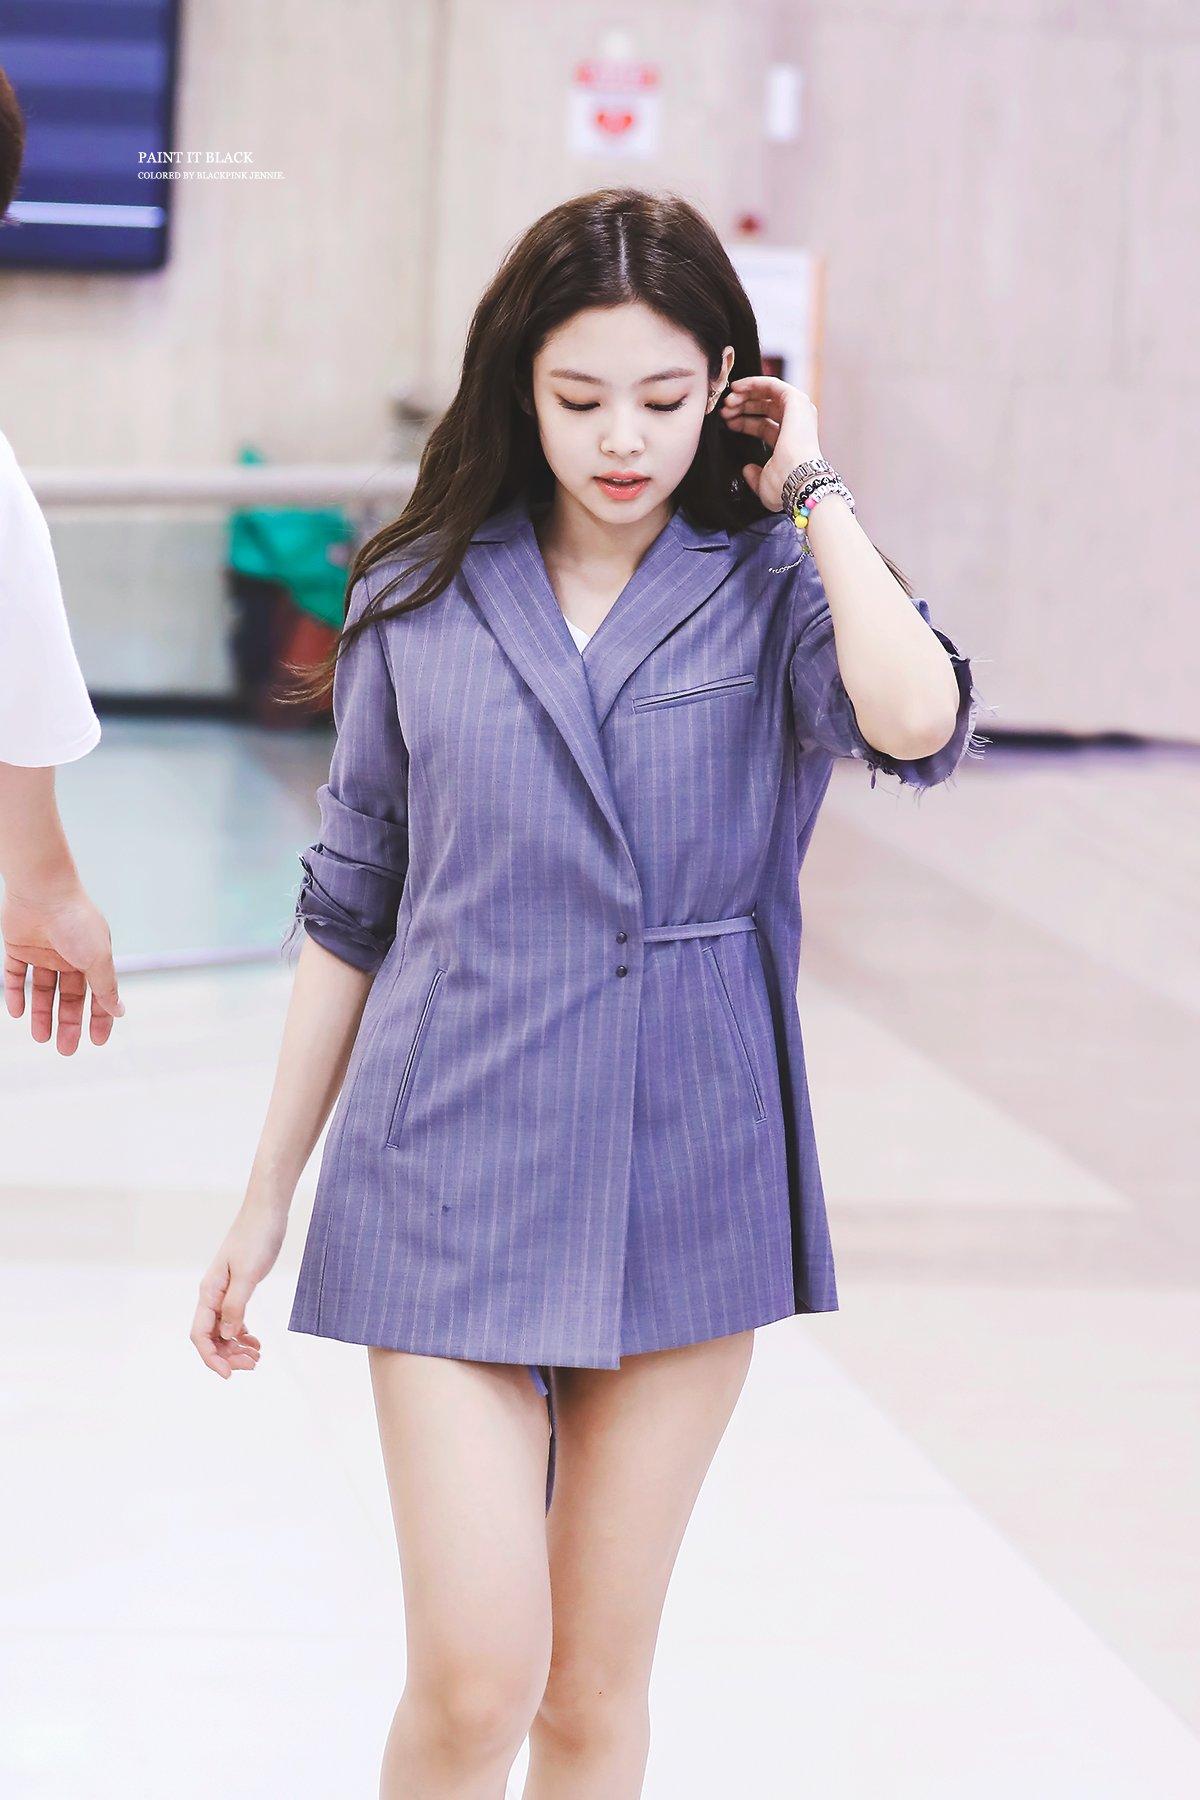 Jennie | From Reddit in 2019 | Blackpink, Blackpink fashion